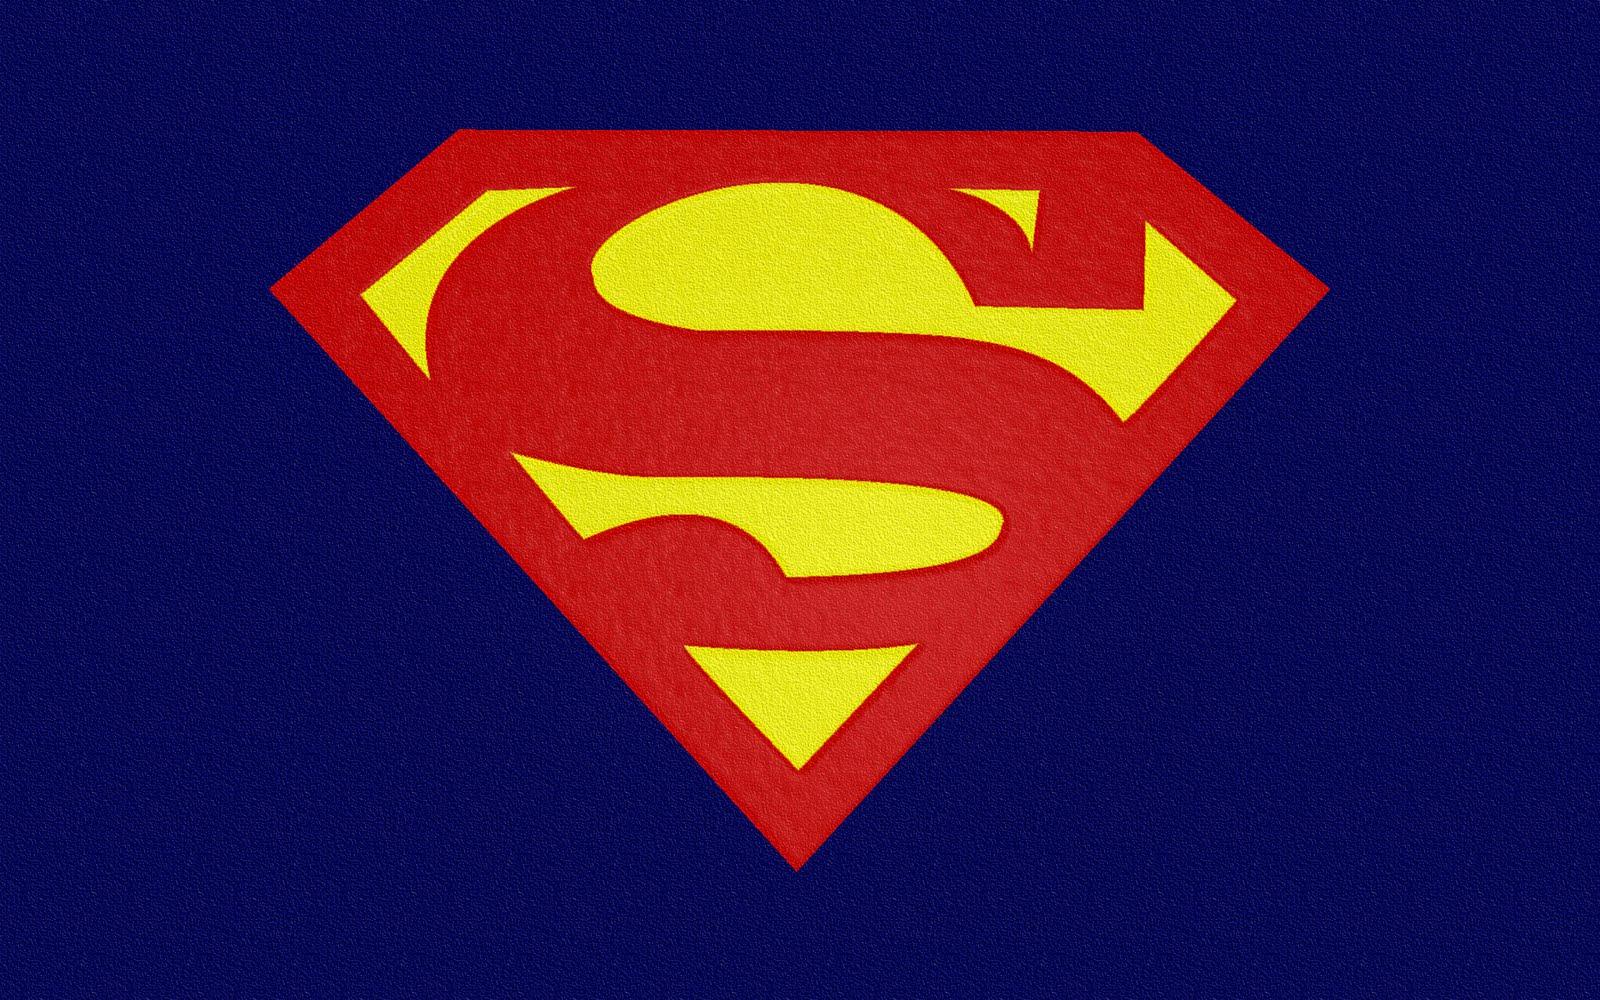 Superman Logo Hd Widescreen Sky Hd 1600x1000 pixel Popular HD 1600x1000